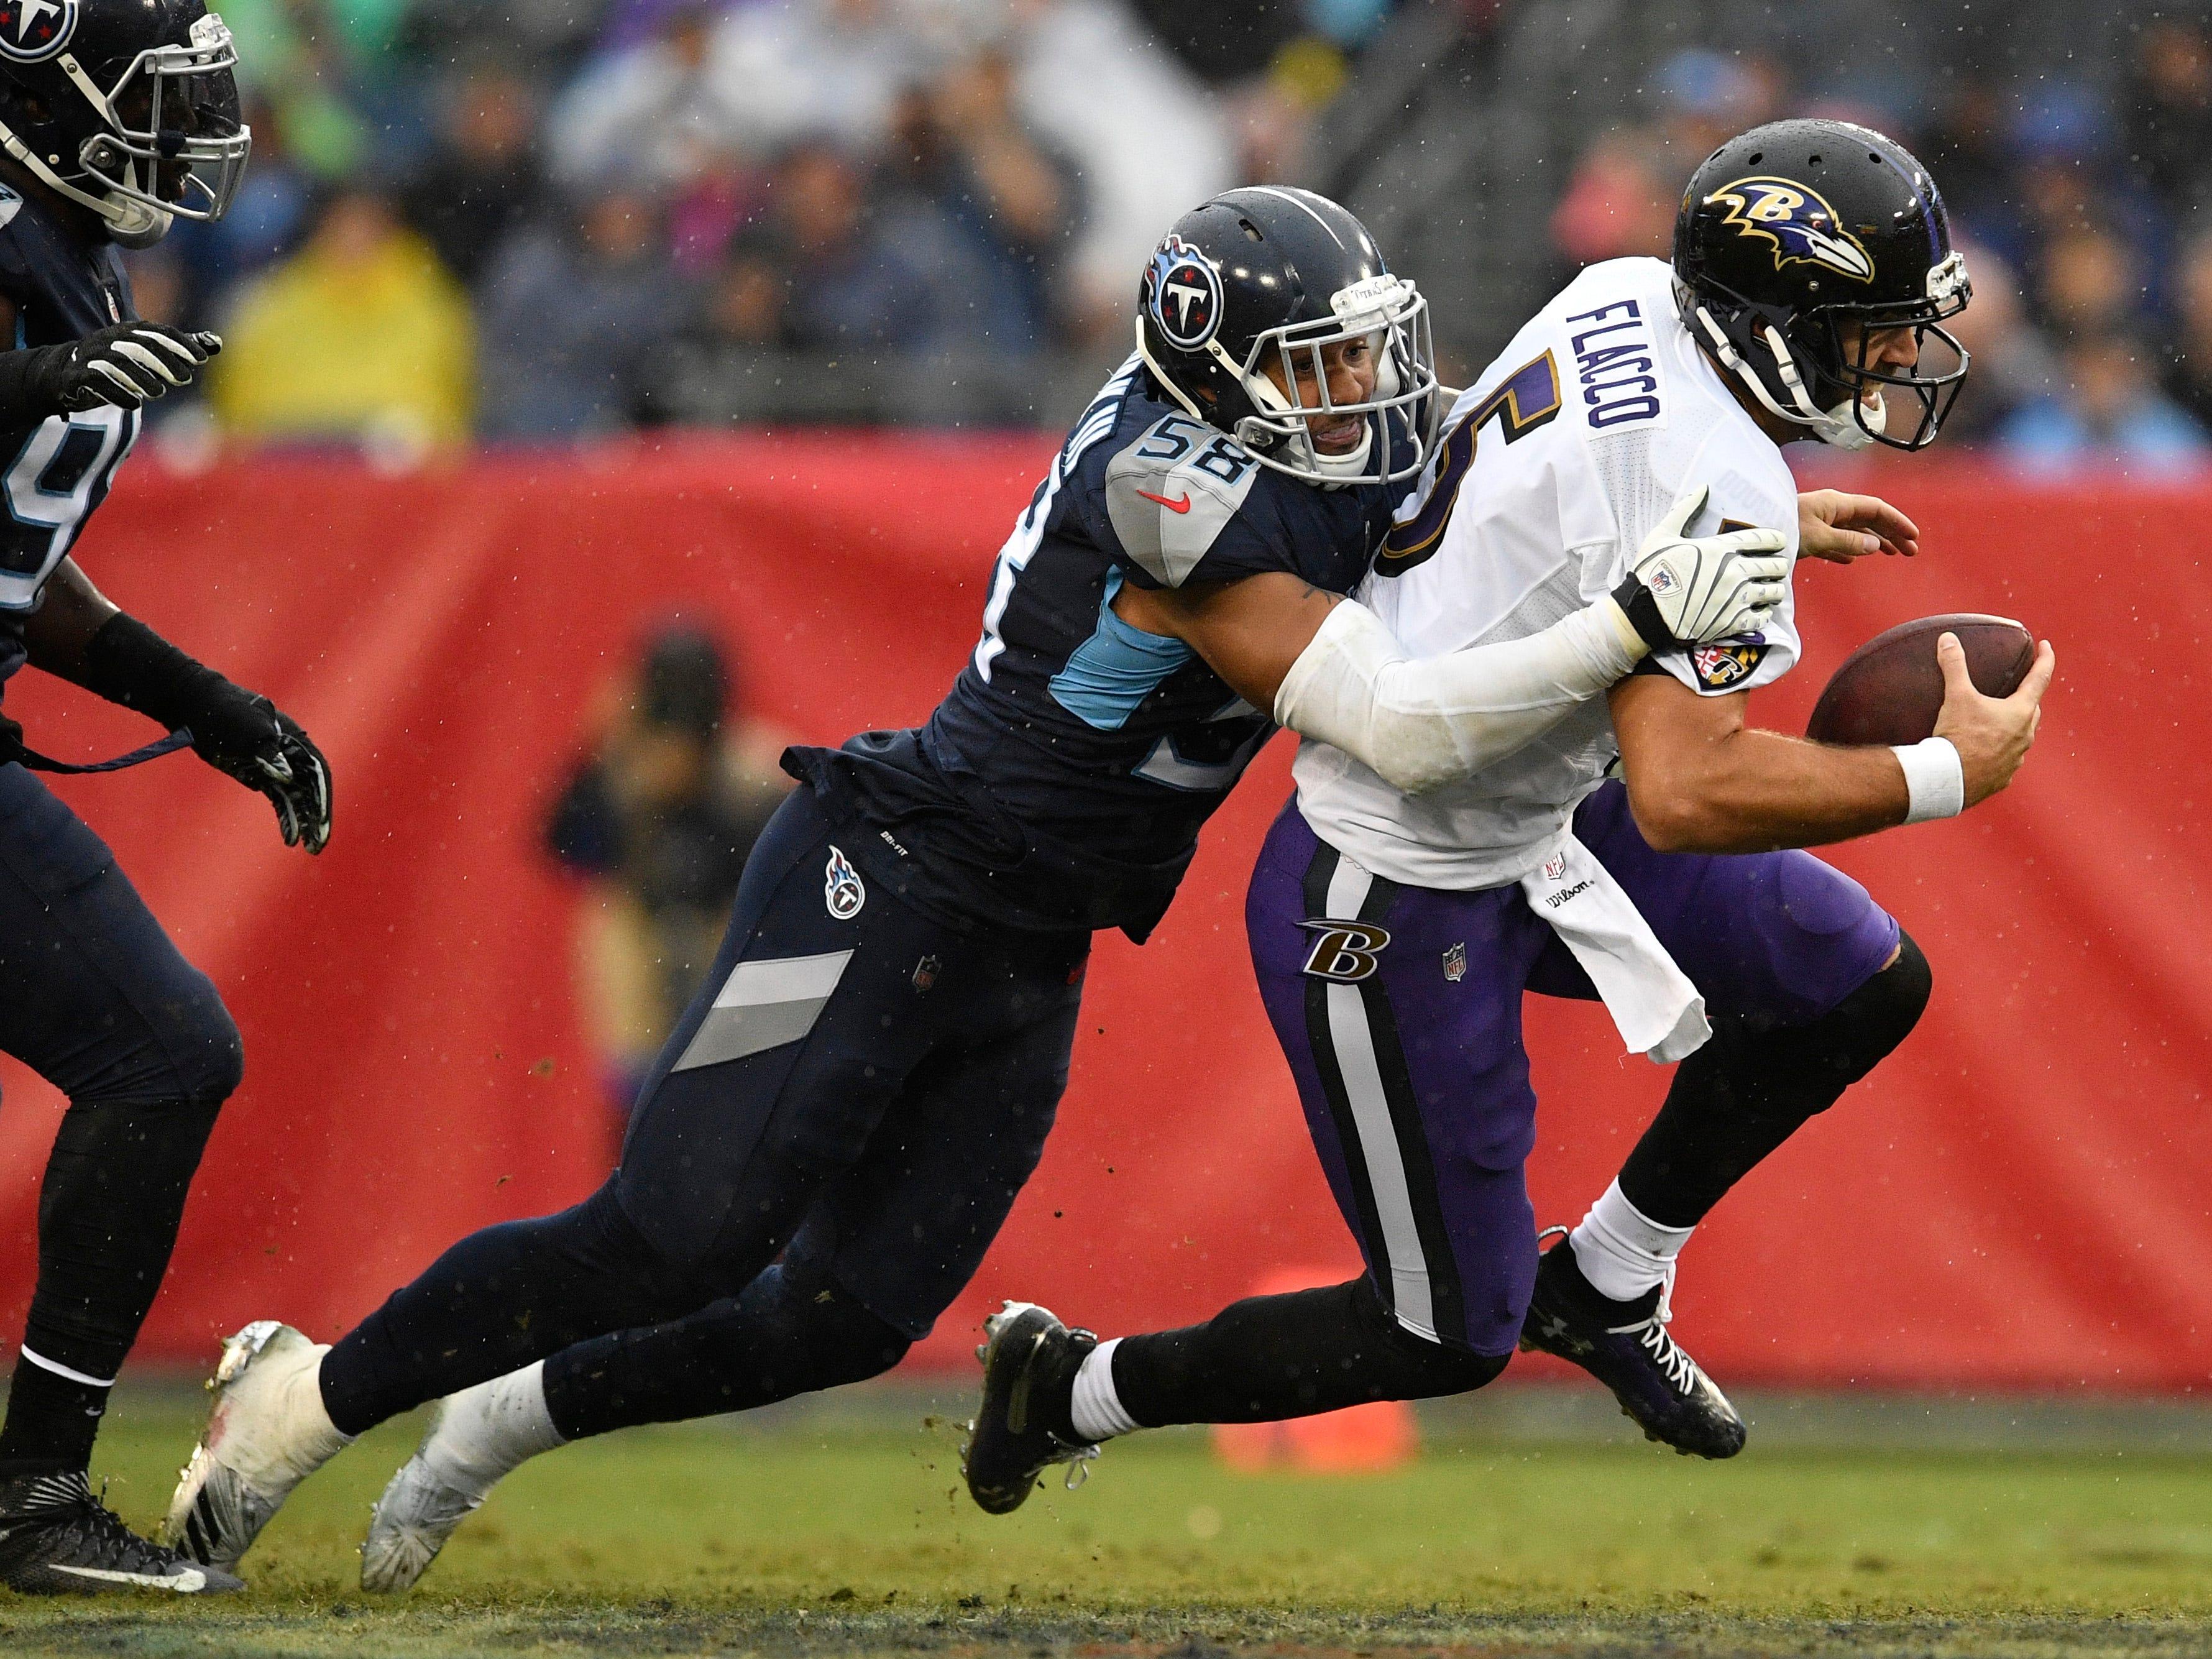 Titans linebacker Harold Landry (58) drops Ravens quarterback Joe Flacco (5) in the second quarter at Nissan Stadium Sunday, Oct. 14, 2018, in Nashville, Tenn.